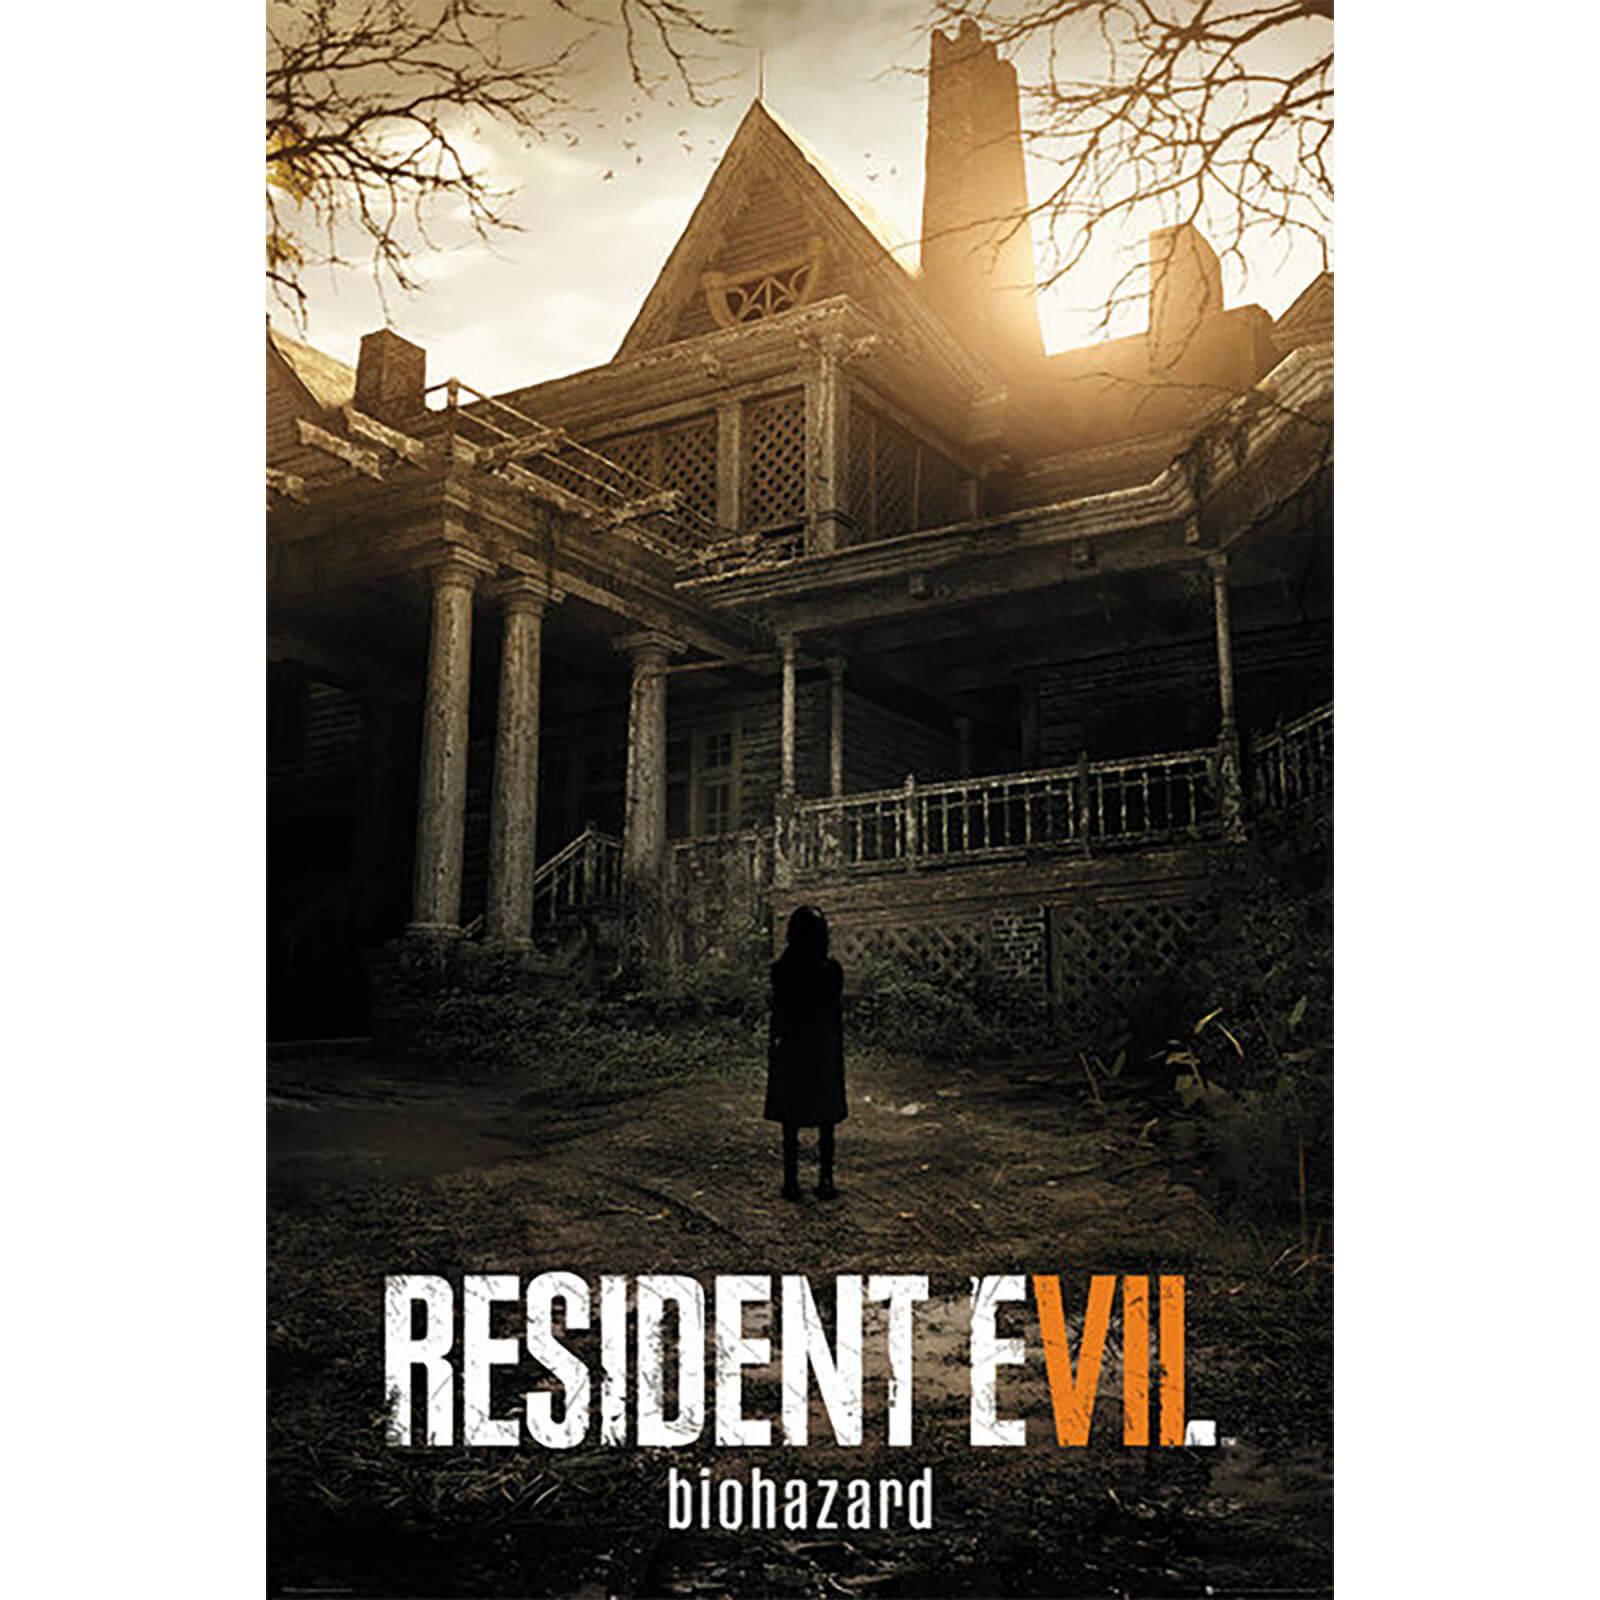 Resident Evil 7 Key Art - 61 x 91 5cm Maxi Poster